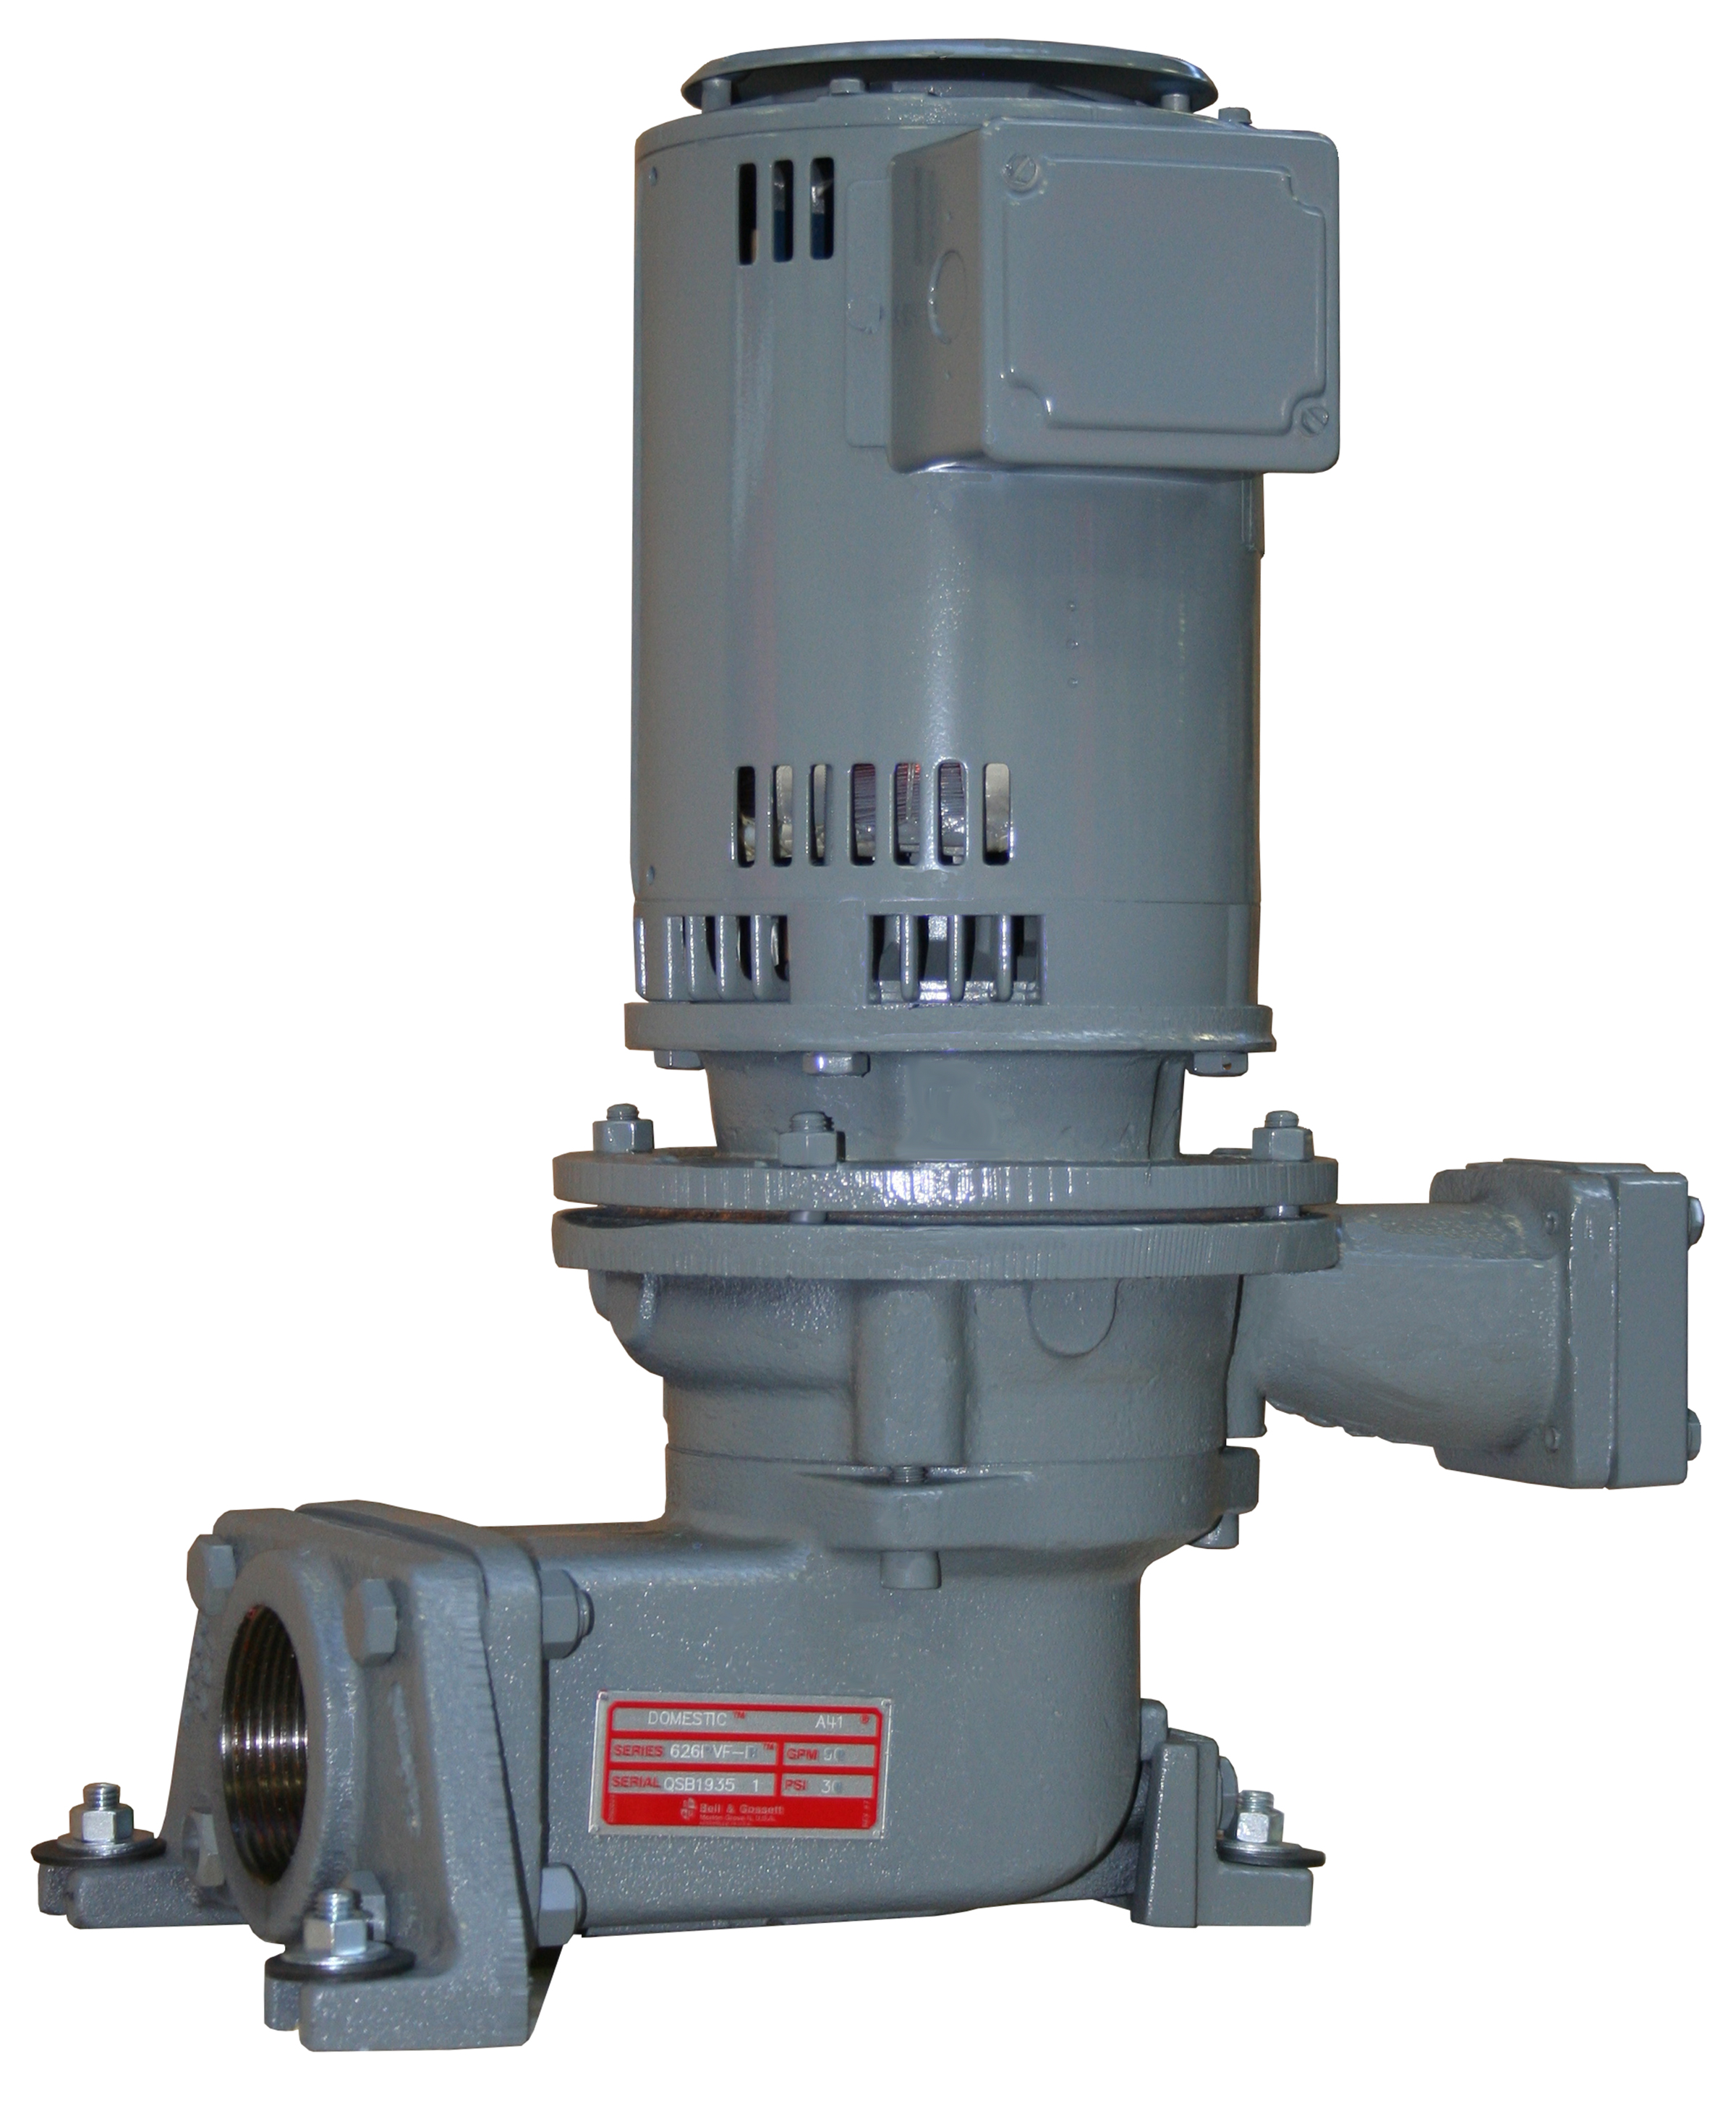 B&G Domestic Series B35 Pump Style PVF-B